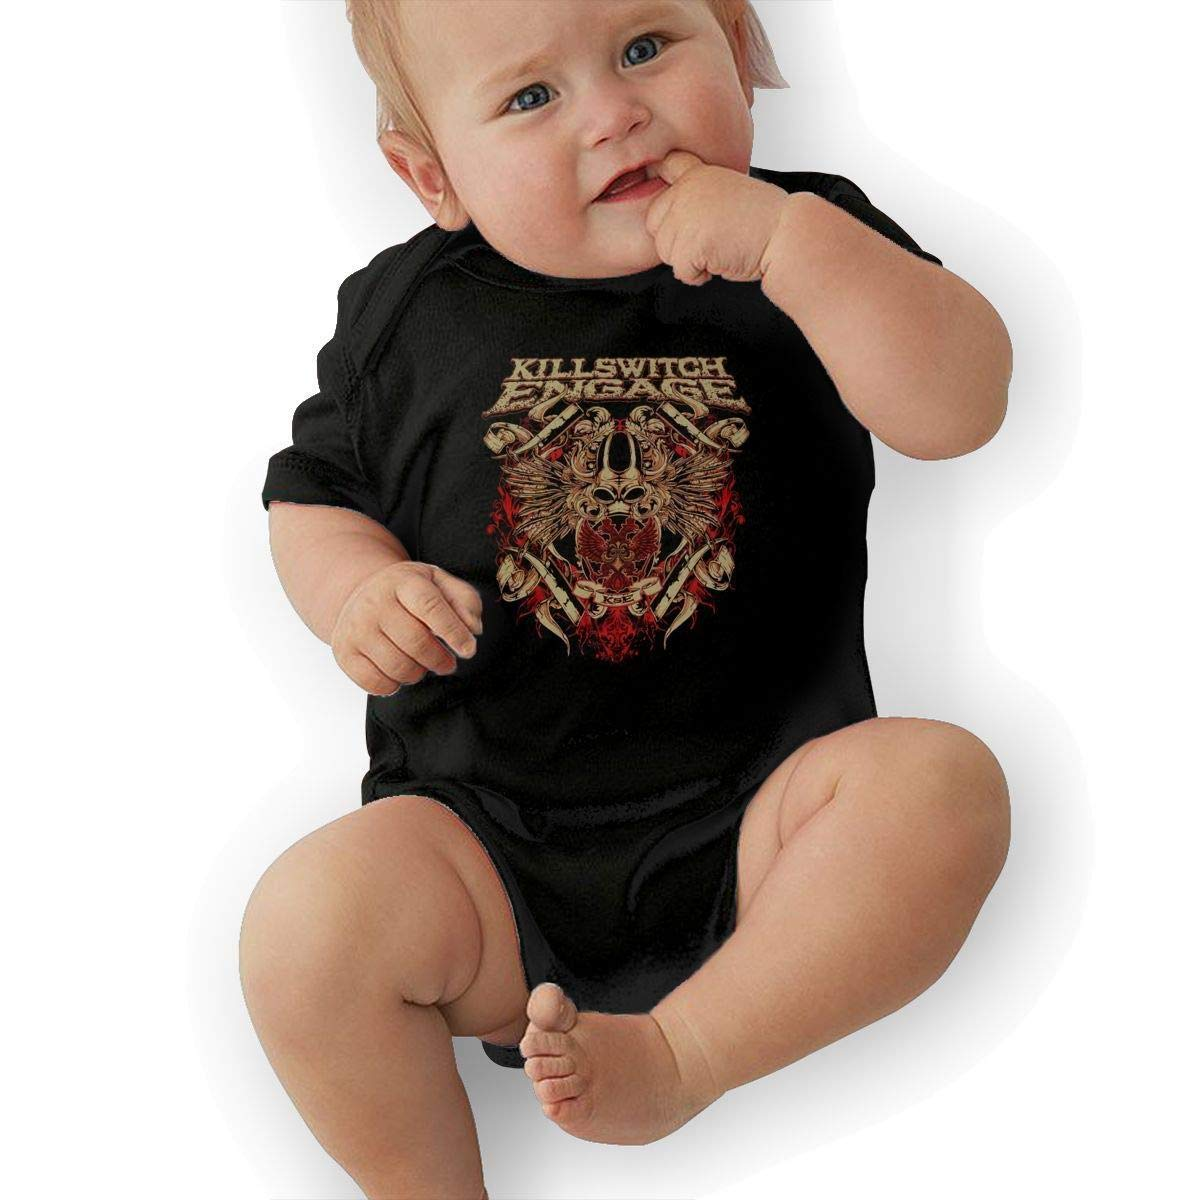 SHWPAKFA Infant Killswitch Engage Biowar Adorable Soft Music Band Jersey Bodysuit,Black,0-3M